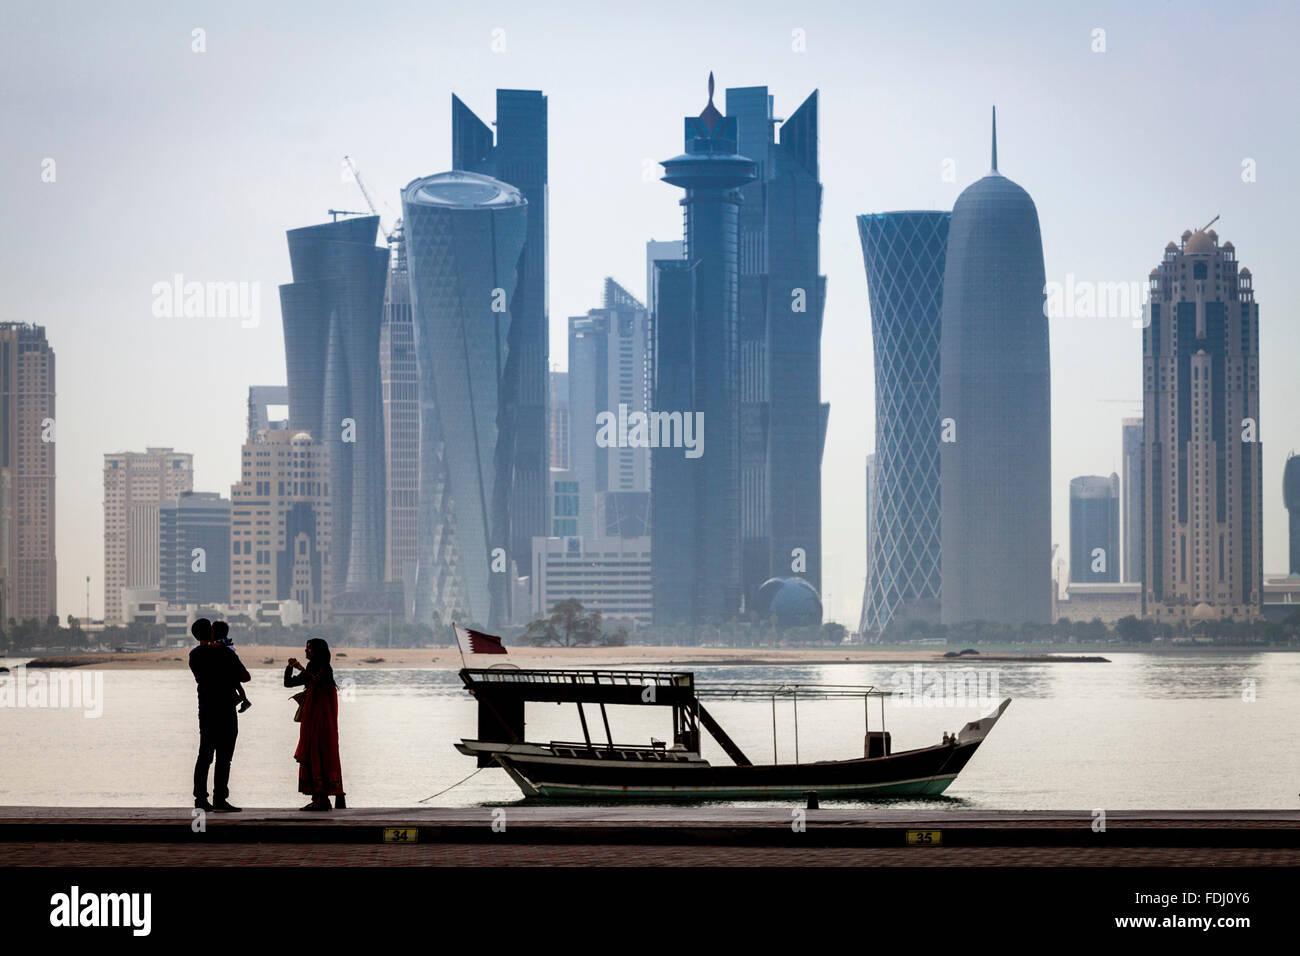 Gratte-ciel de Doha, Doha, Qatar Photo Stock